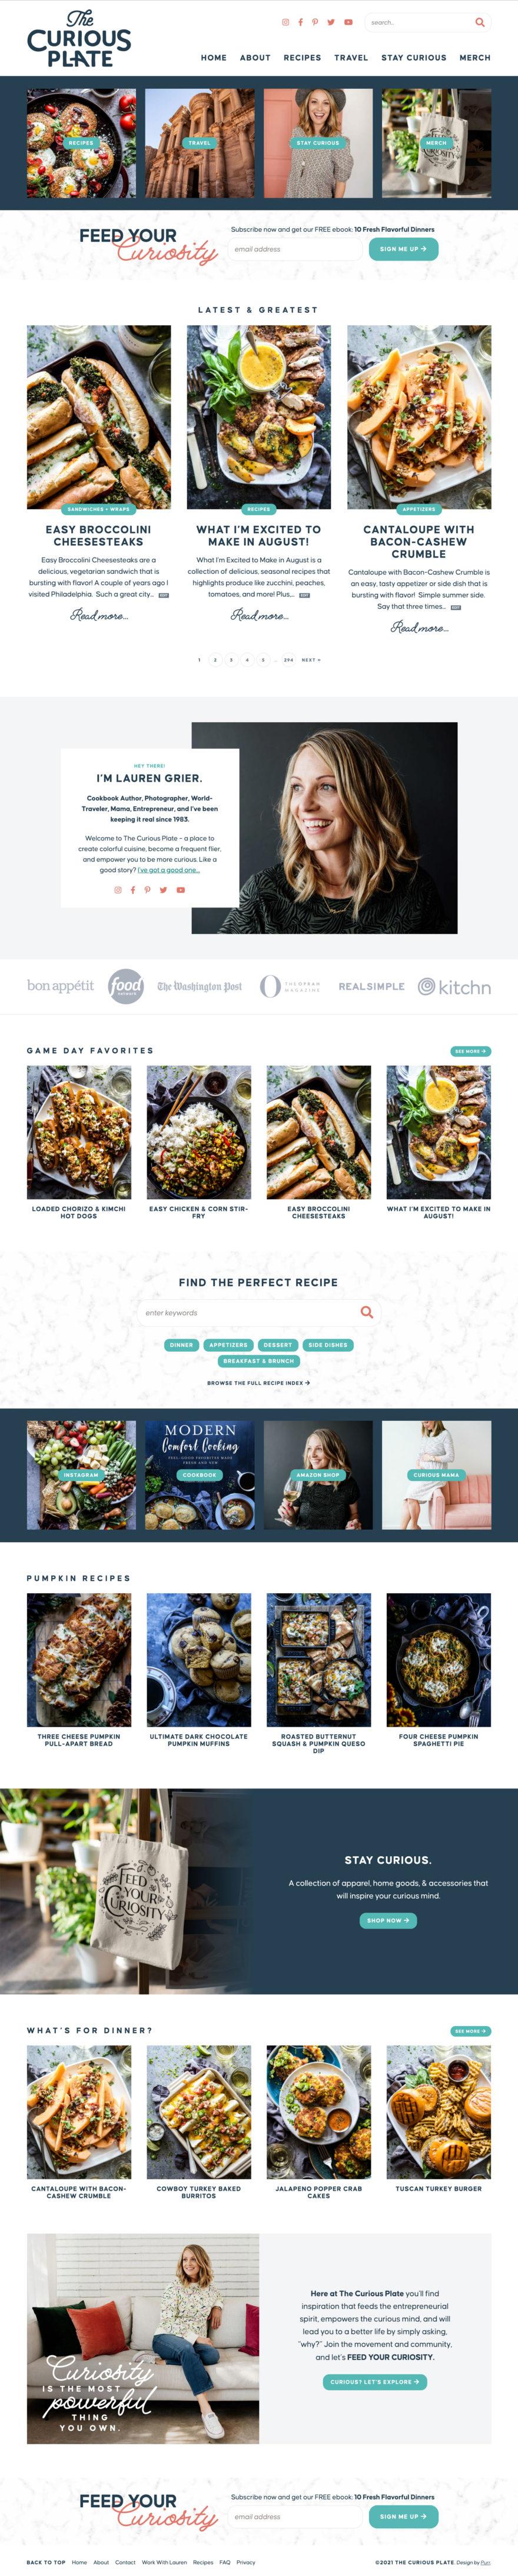 The Curious Plate homepage screenshot